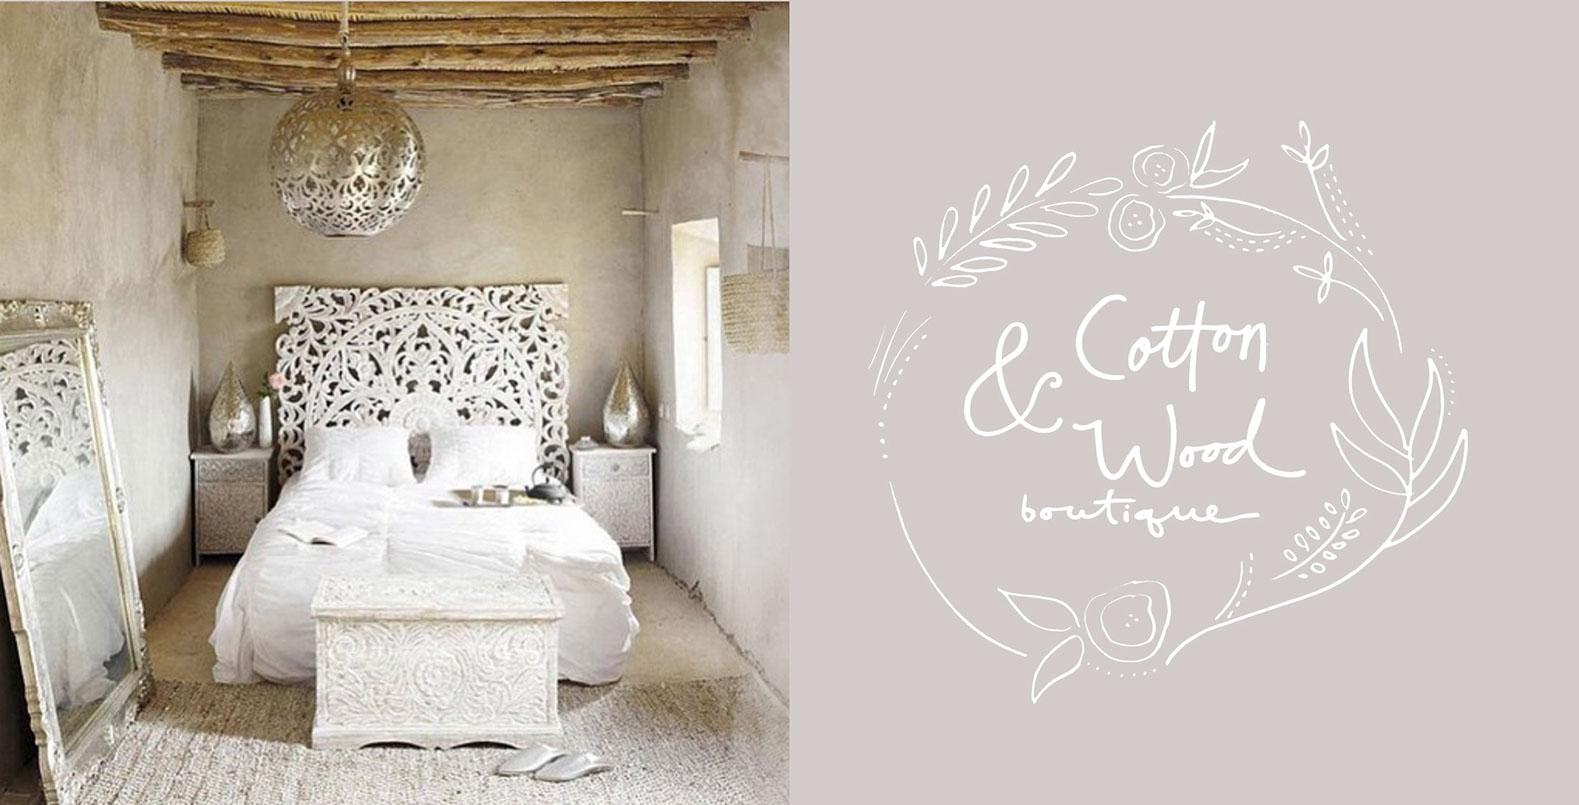 Cotton and Wood boutique logo, uniquely hand-drawn design